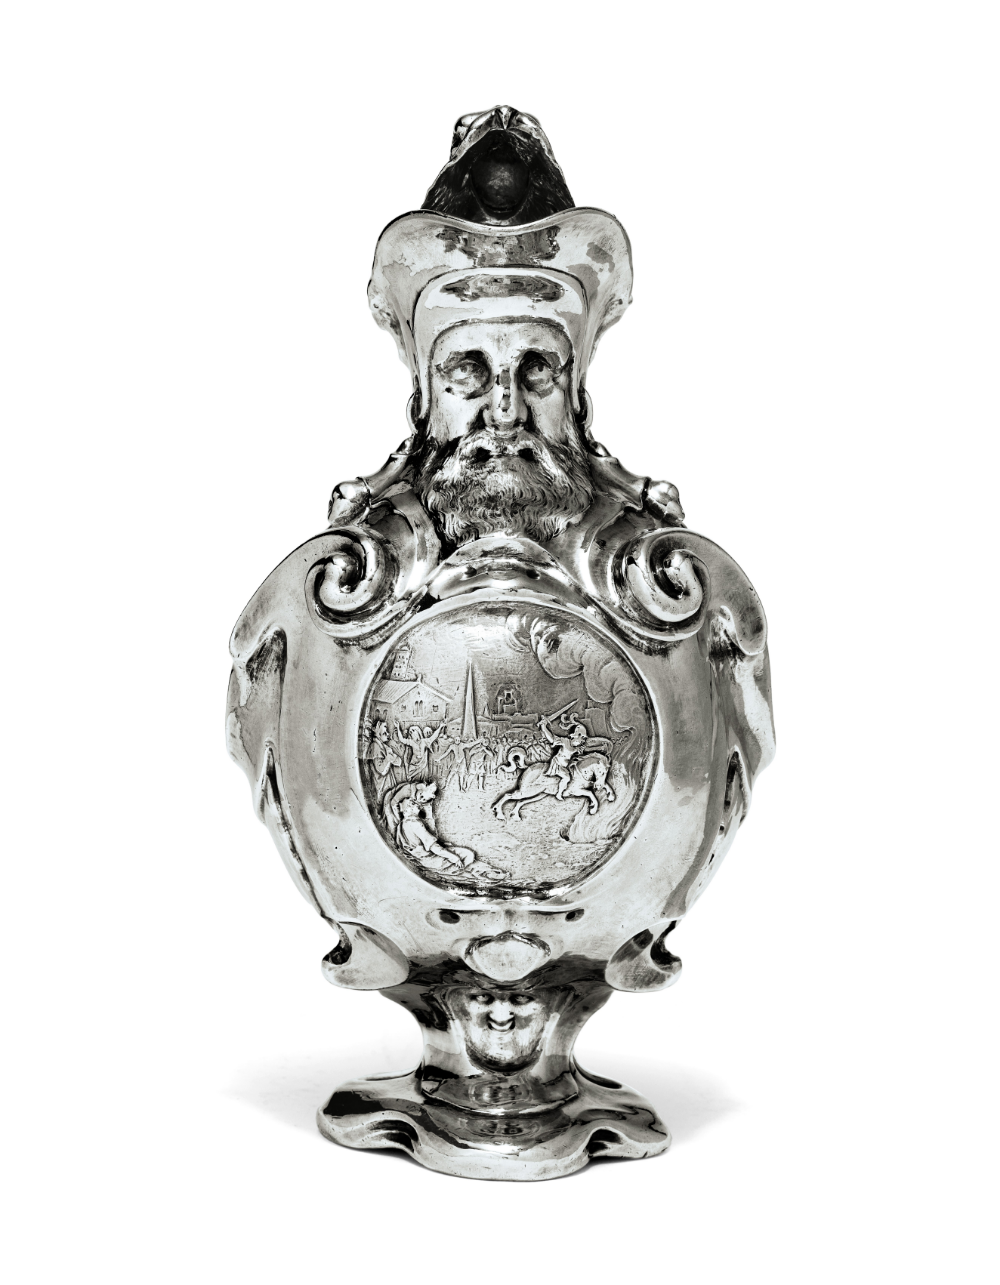 A Dutch silver ewer with scenes including Marcus Curtius sacrifice, 1619,  Adam van Vianen,  Utrecht, Netherlands